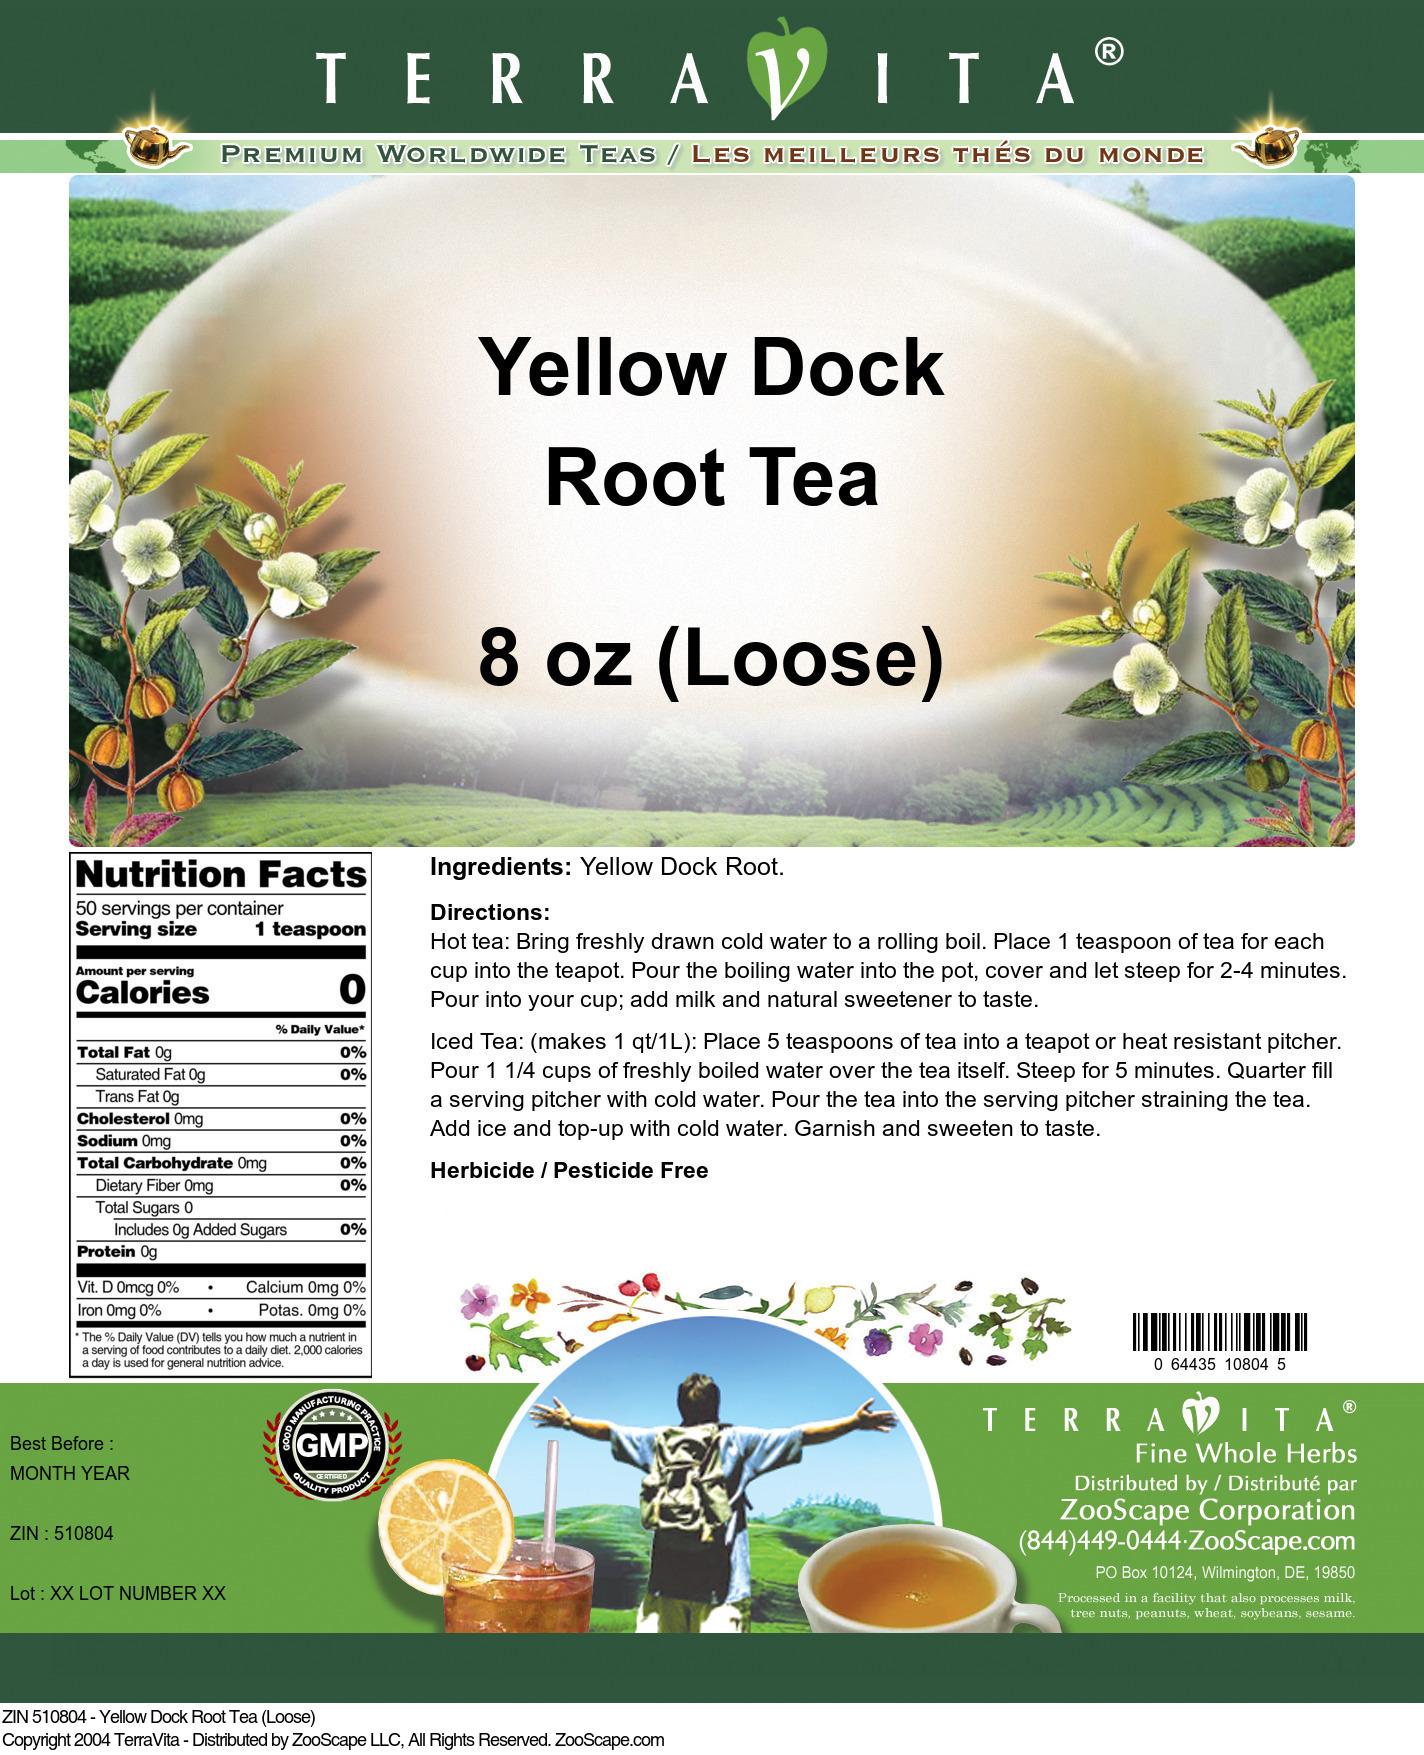 Yellow Dock Root Tea (Loose)